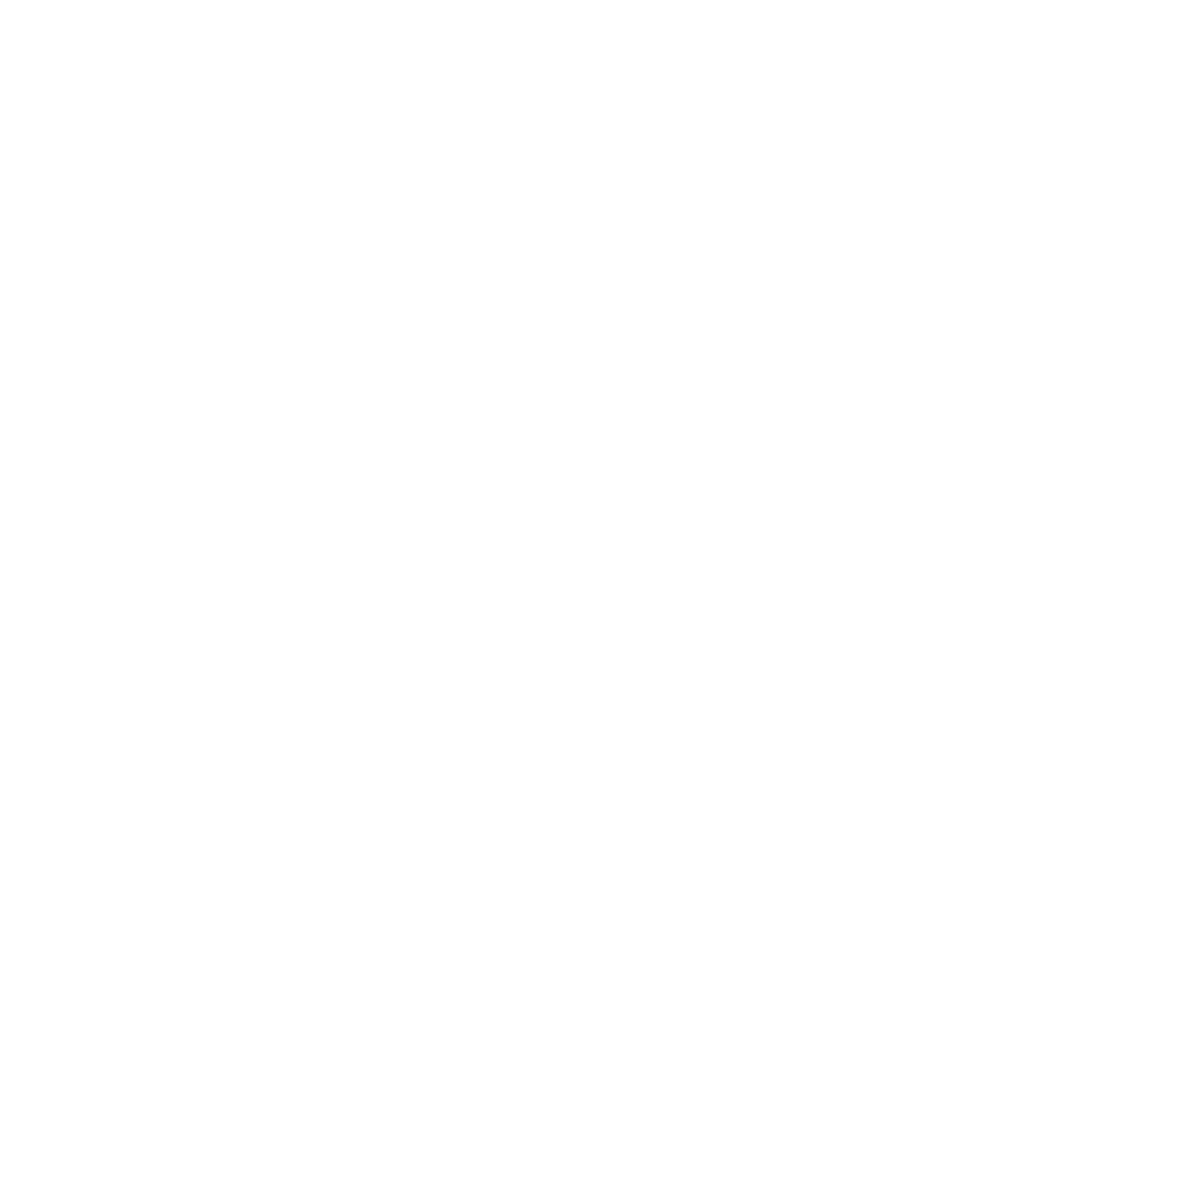 state of alaska division of vocational rehabilitastion